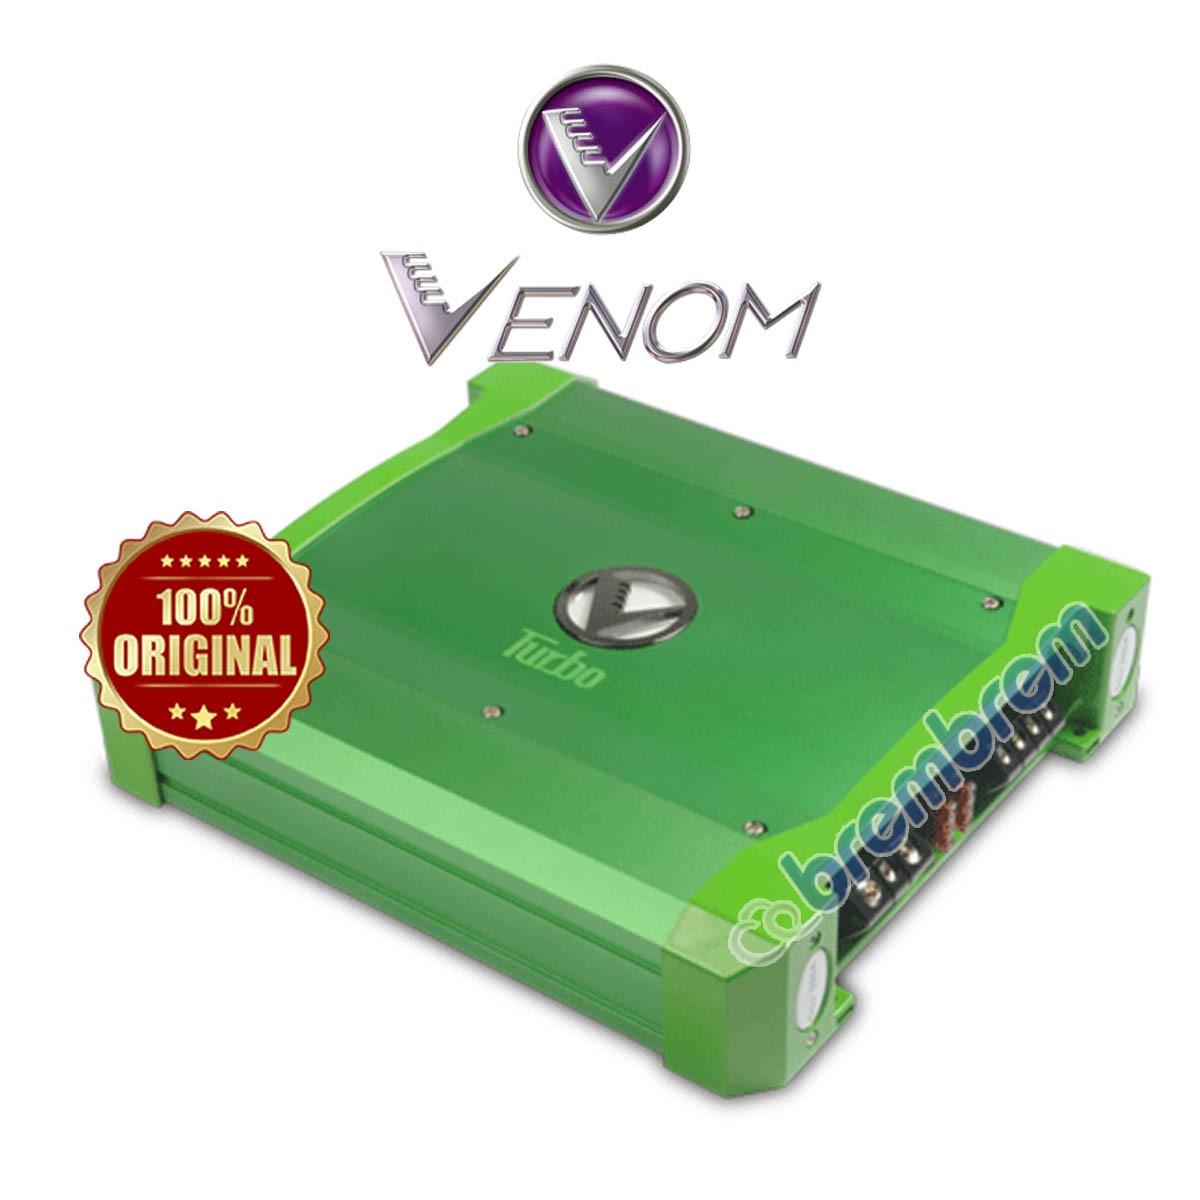 VENOM TURBO SERIES V500.1TO - POWER MONOBLOCK